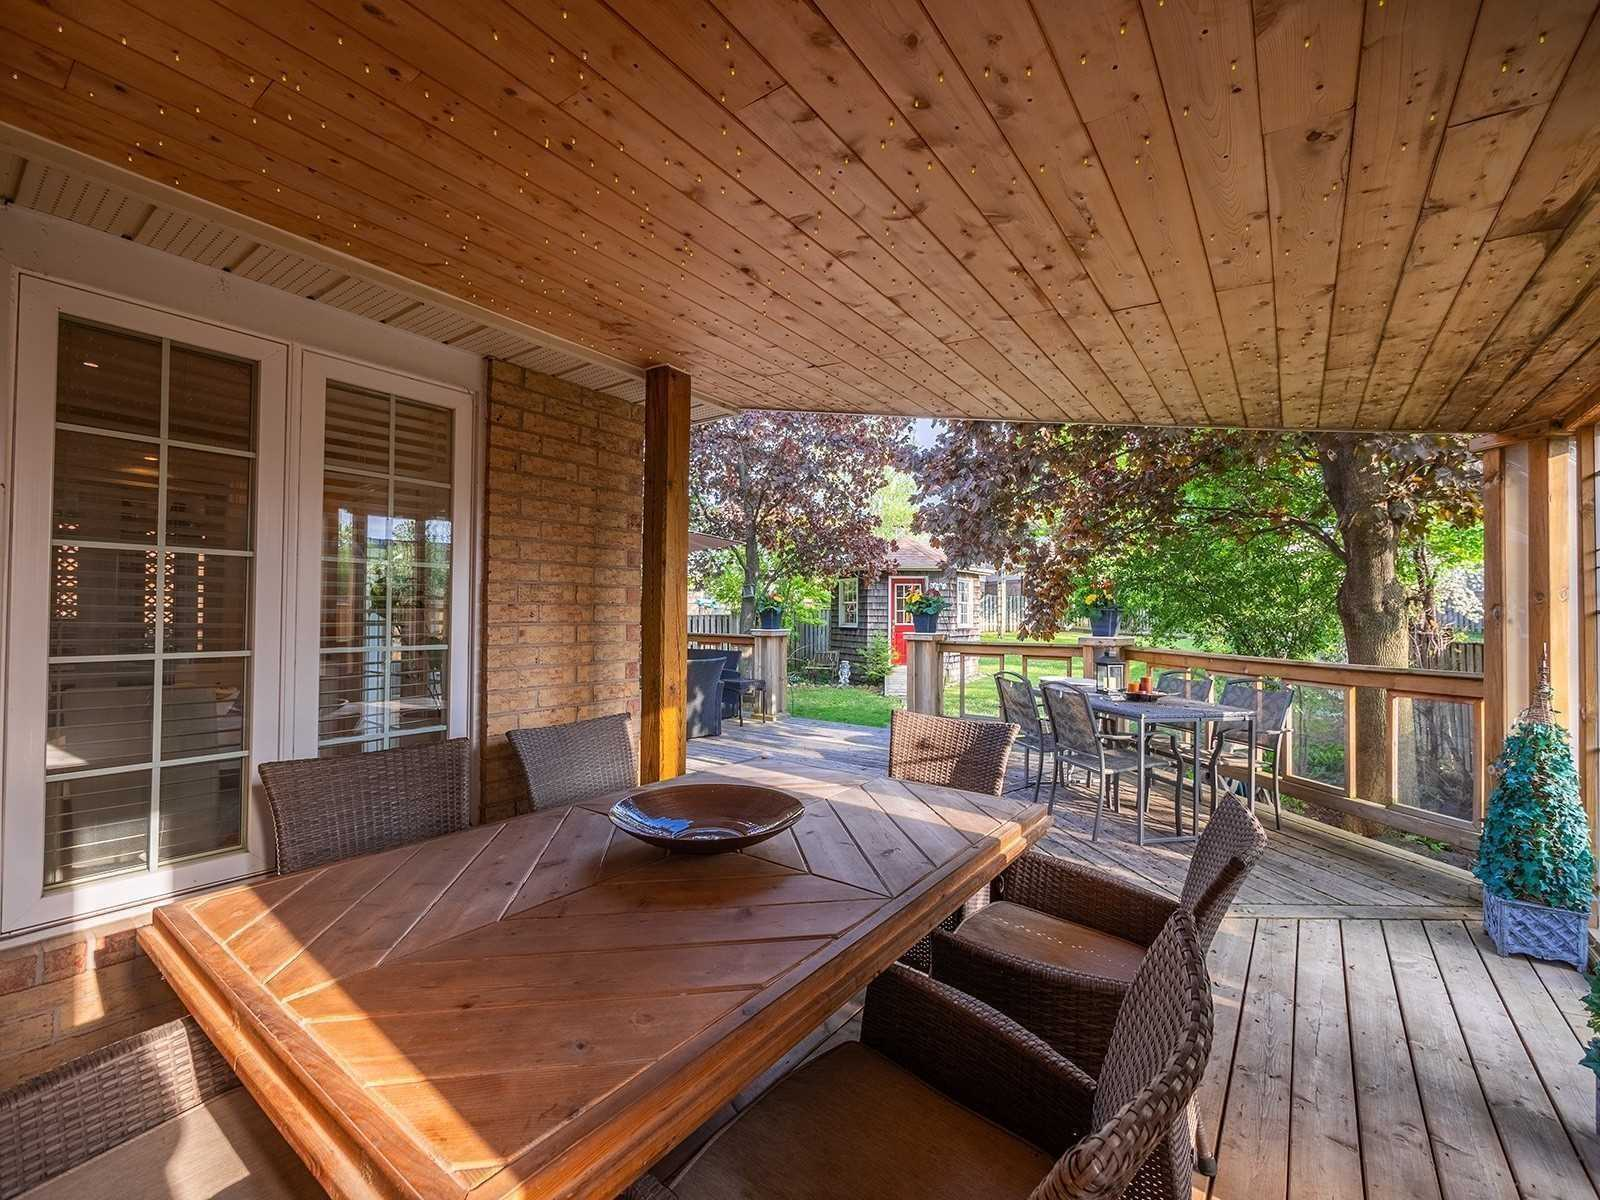 22 Torrance Wood, Brampton